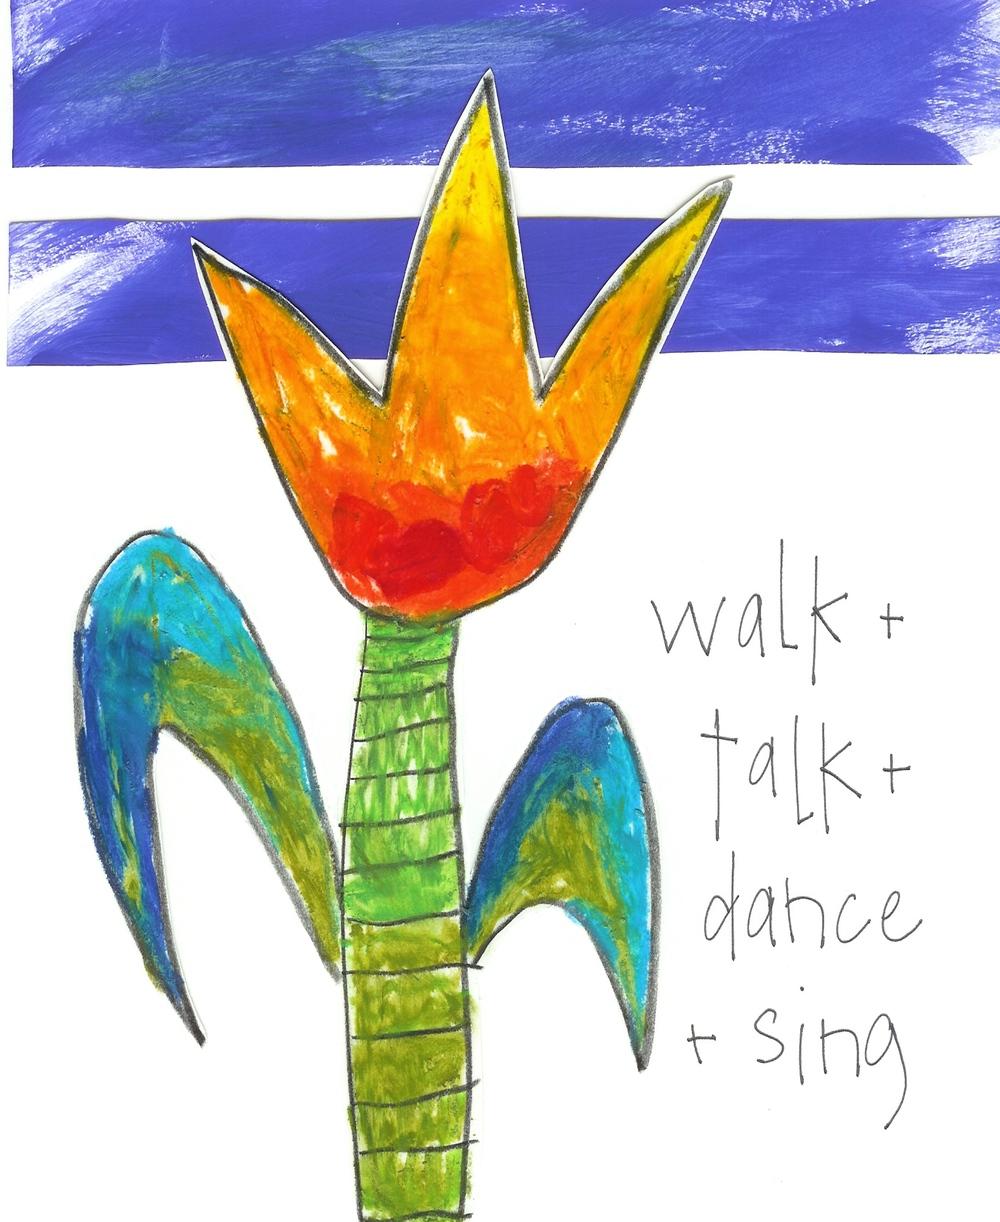 LW_22 walk + talk + dance + sing_14x20.jpg